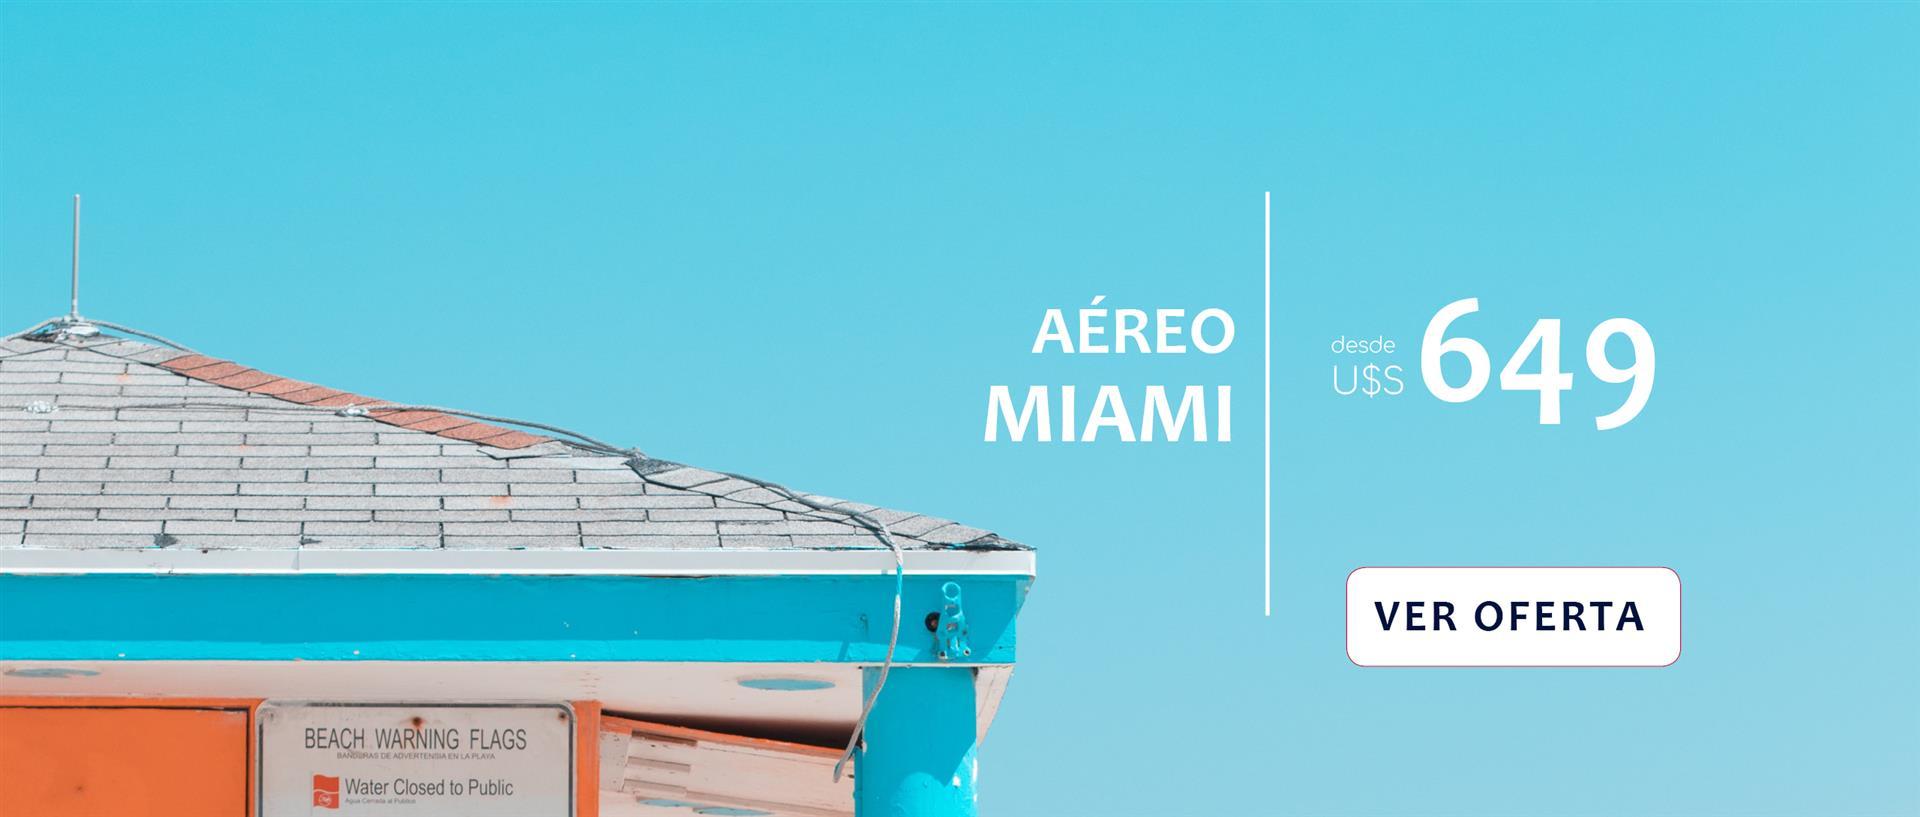 Aéreo Miami